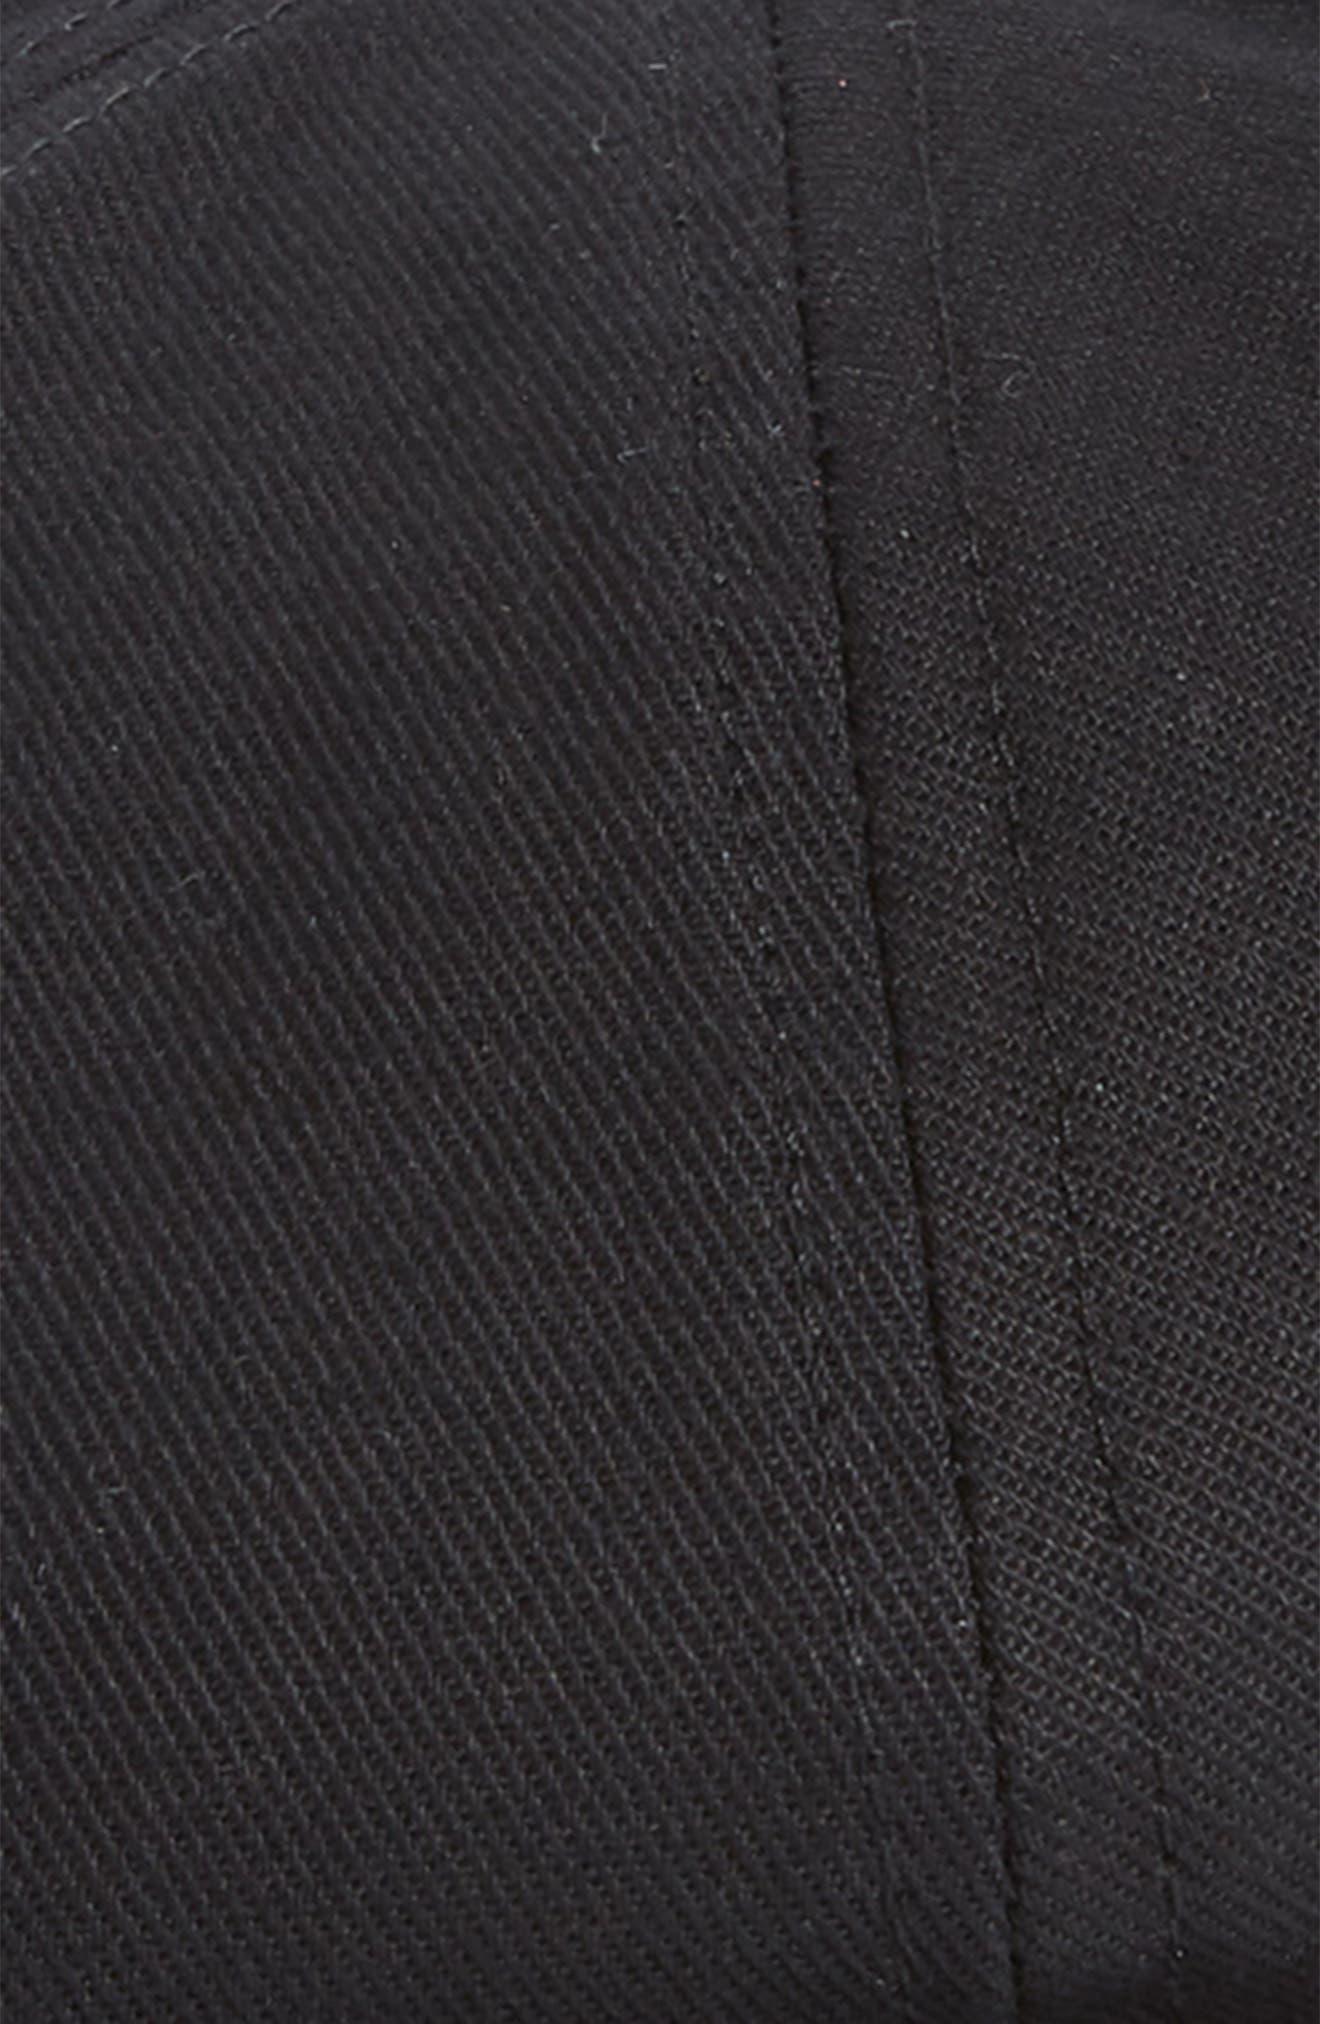 Brood Snap Brim Cap,                             Alternate thumbnail 2, color,                             Black